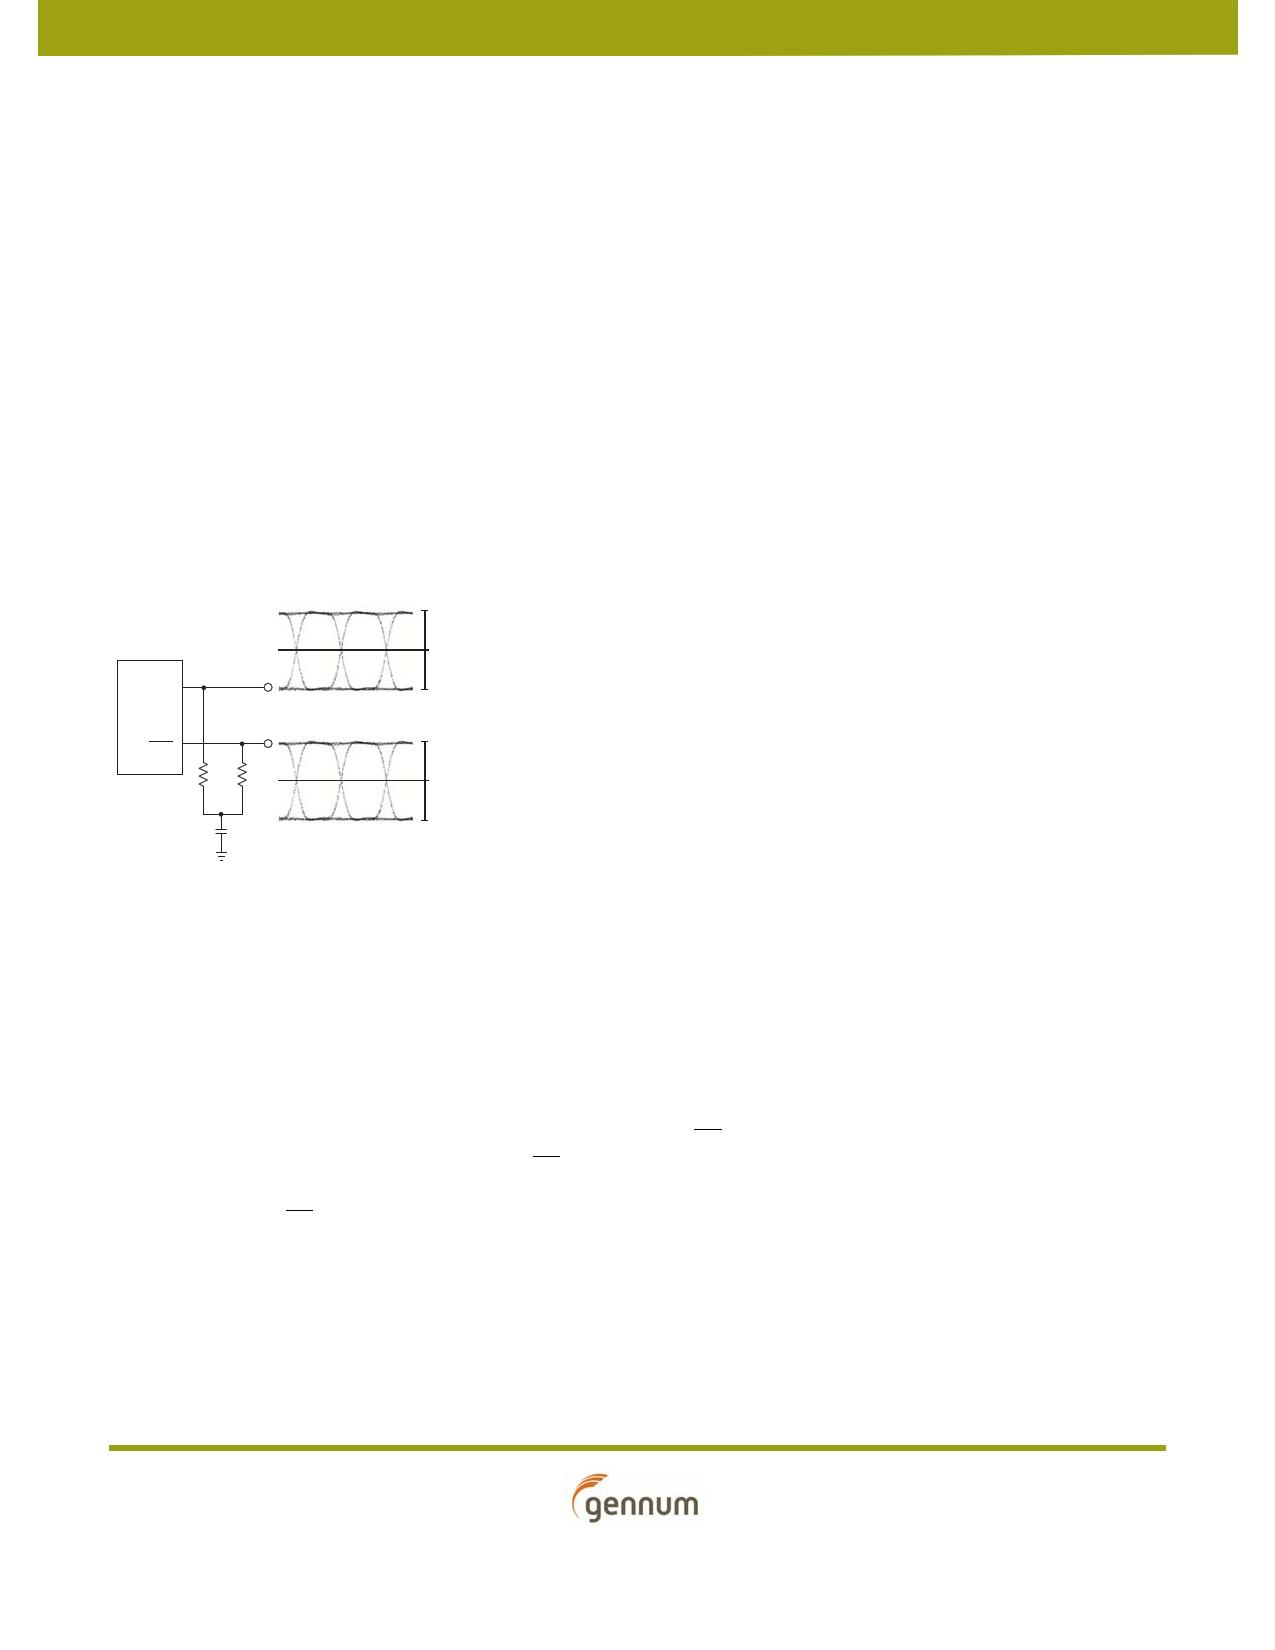 GS2974B arduino